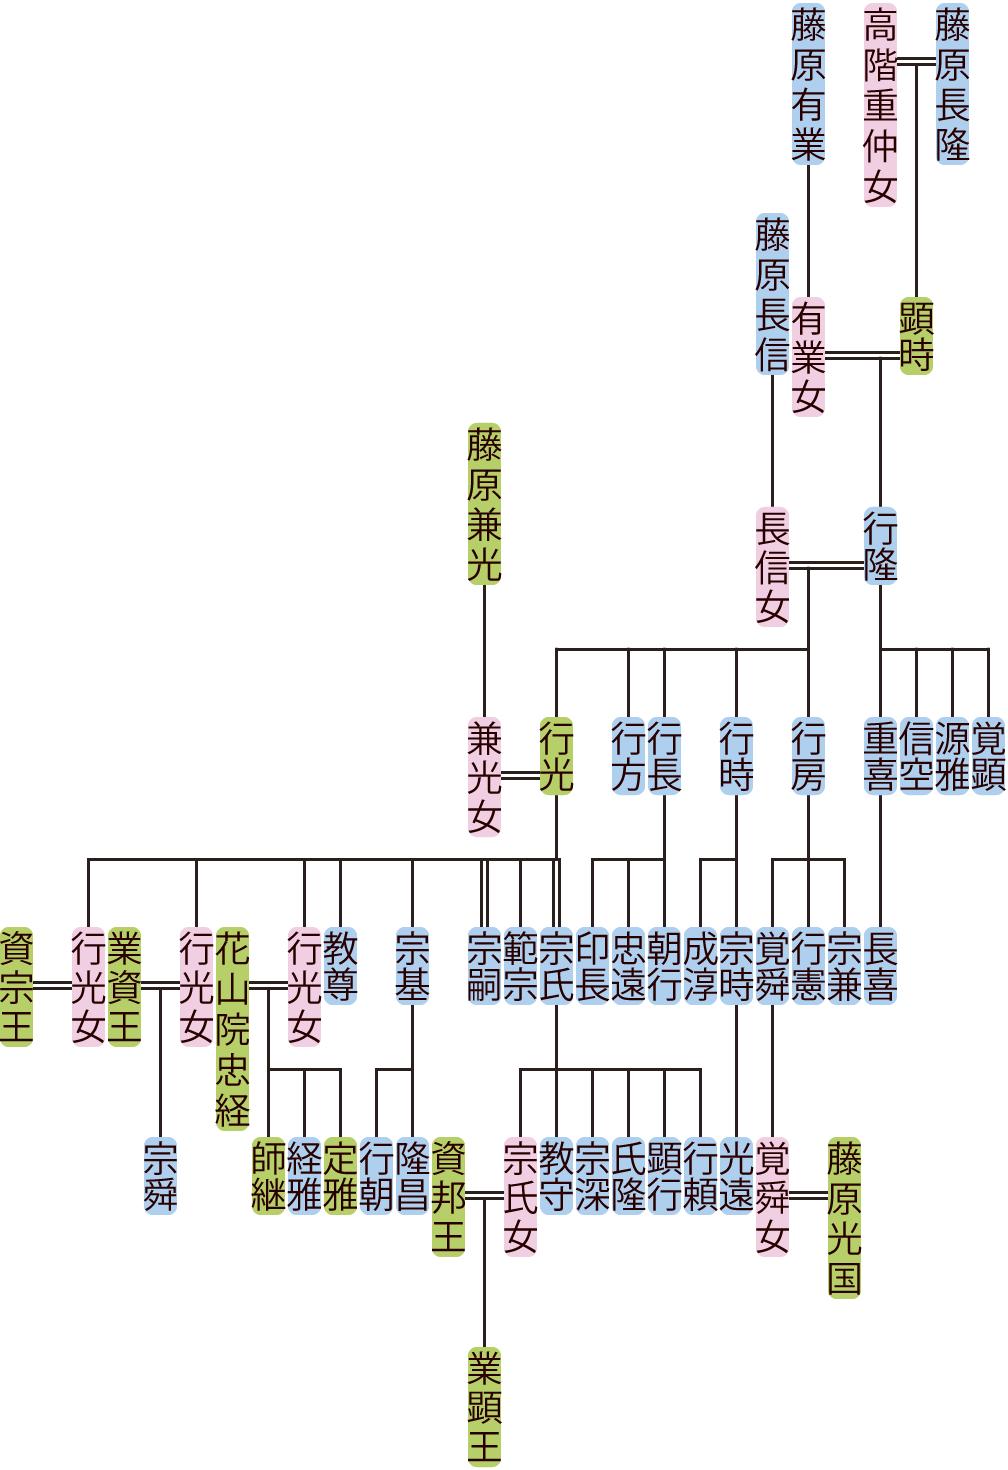 藤原行隆の系図